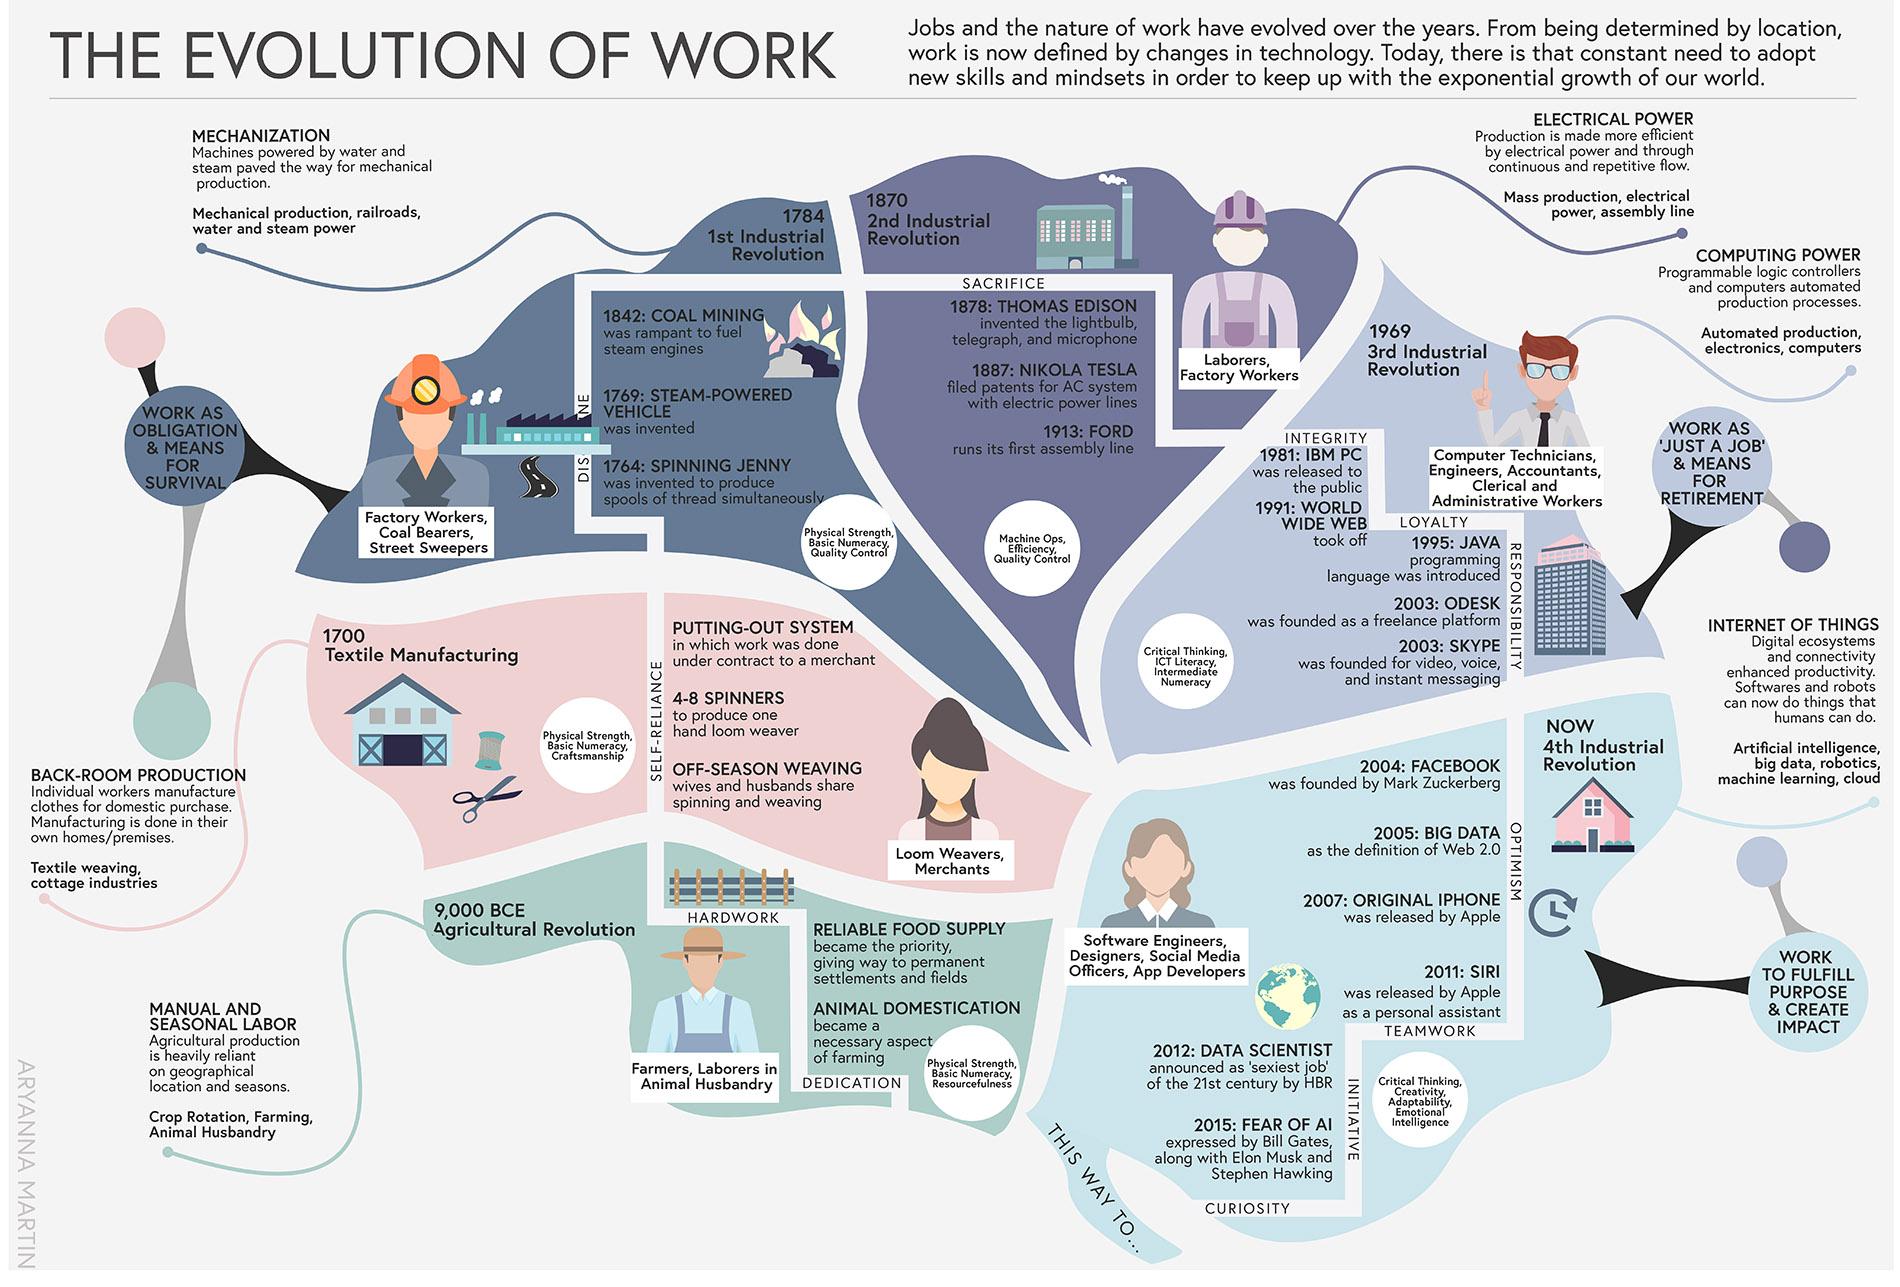 Aryanna Martin - The Evolution of Work.jpeg